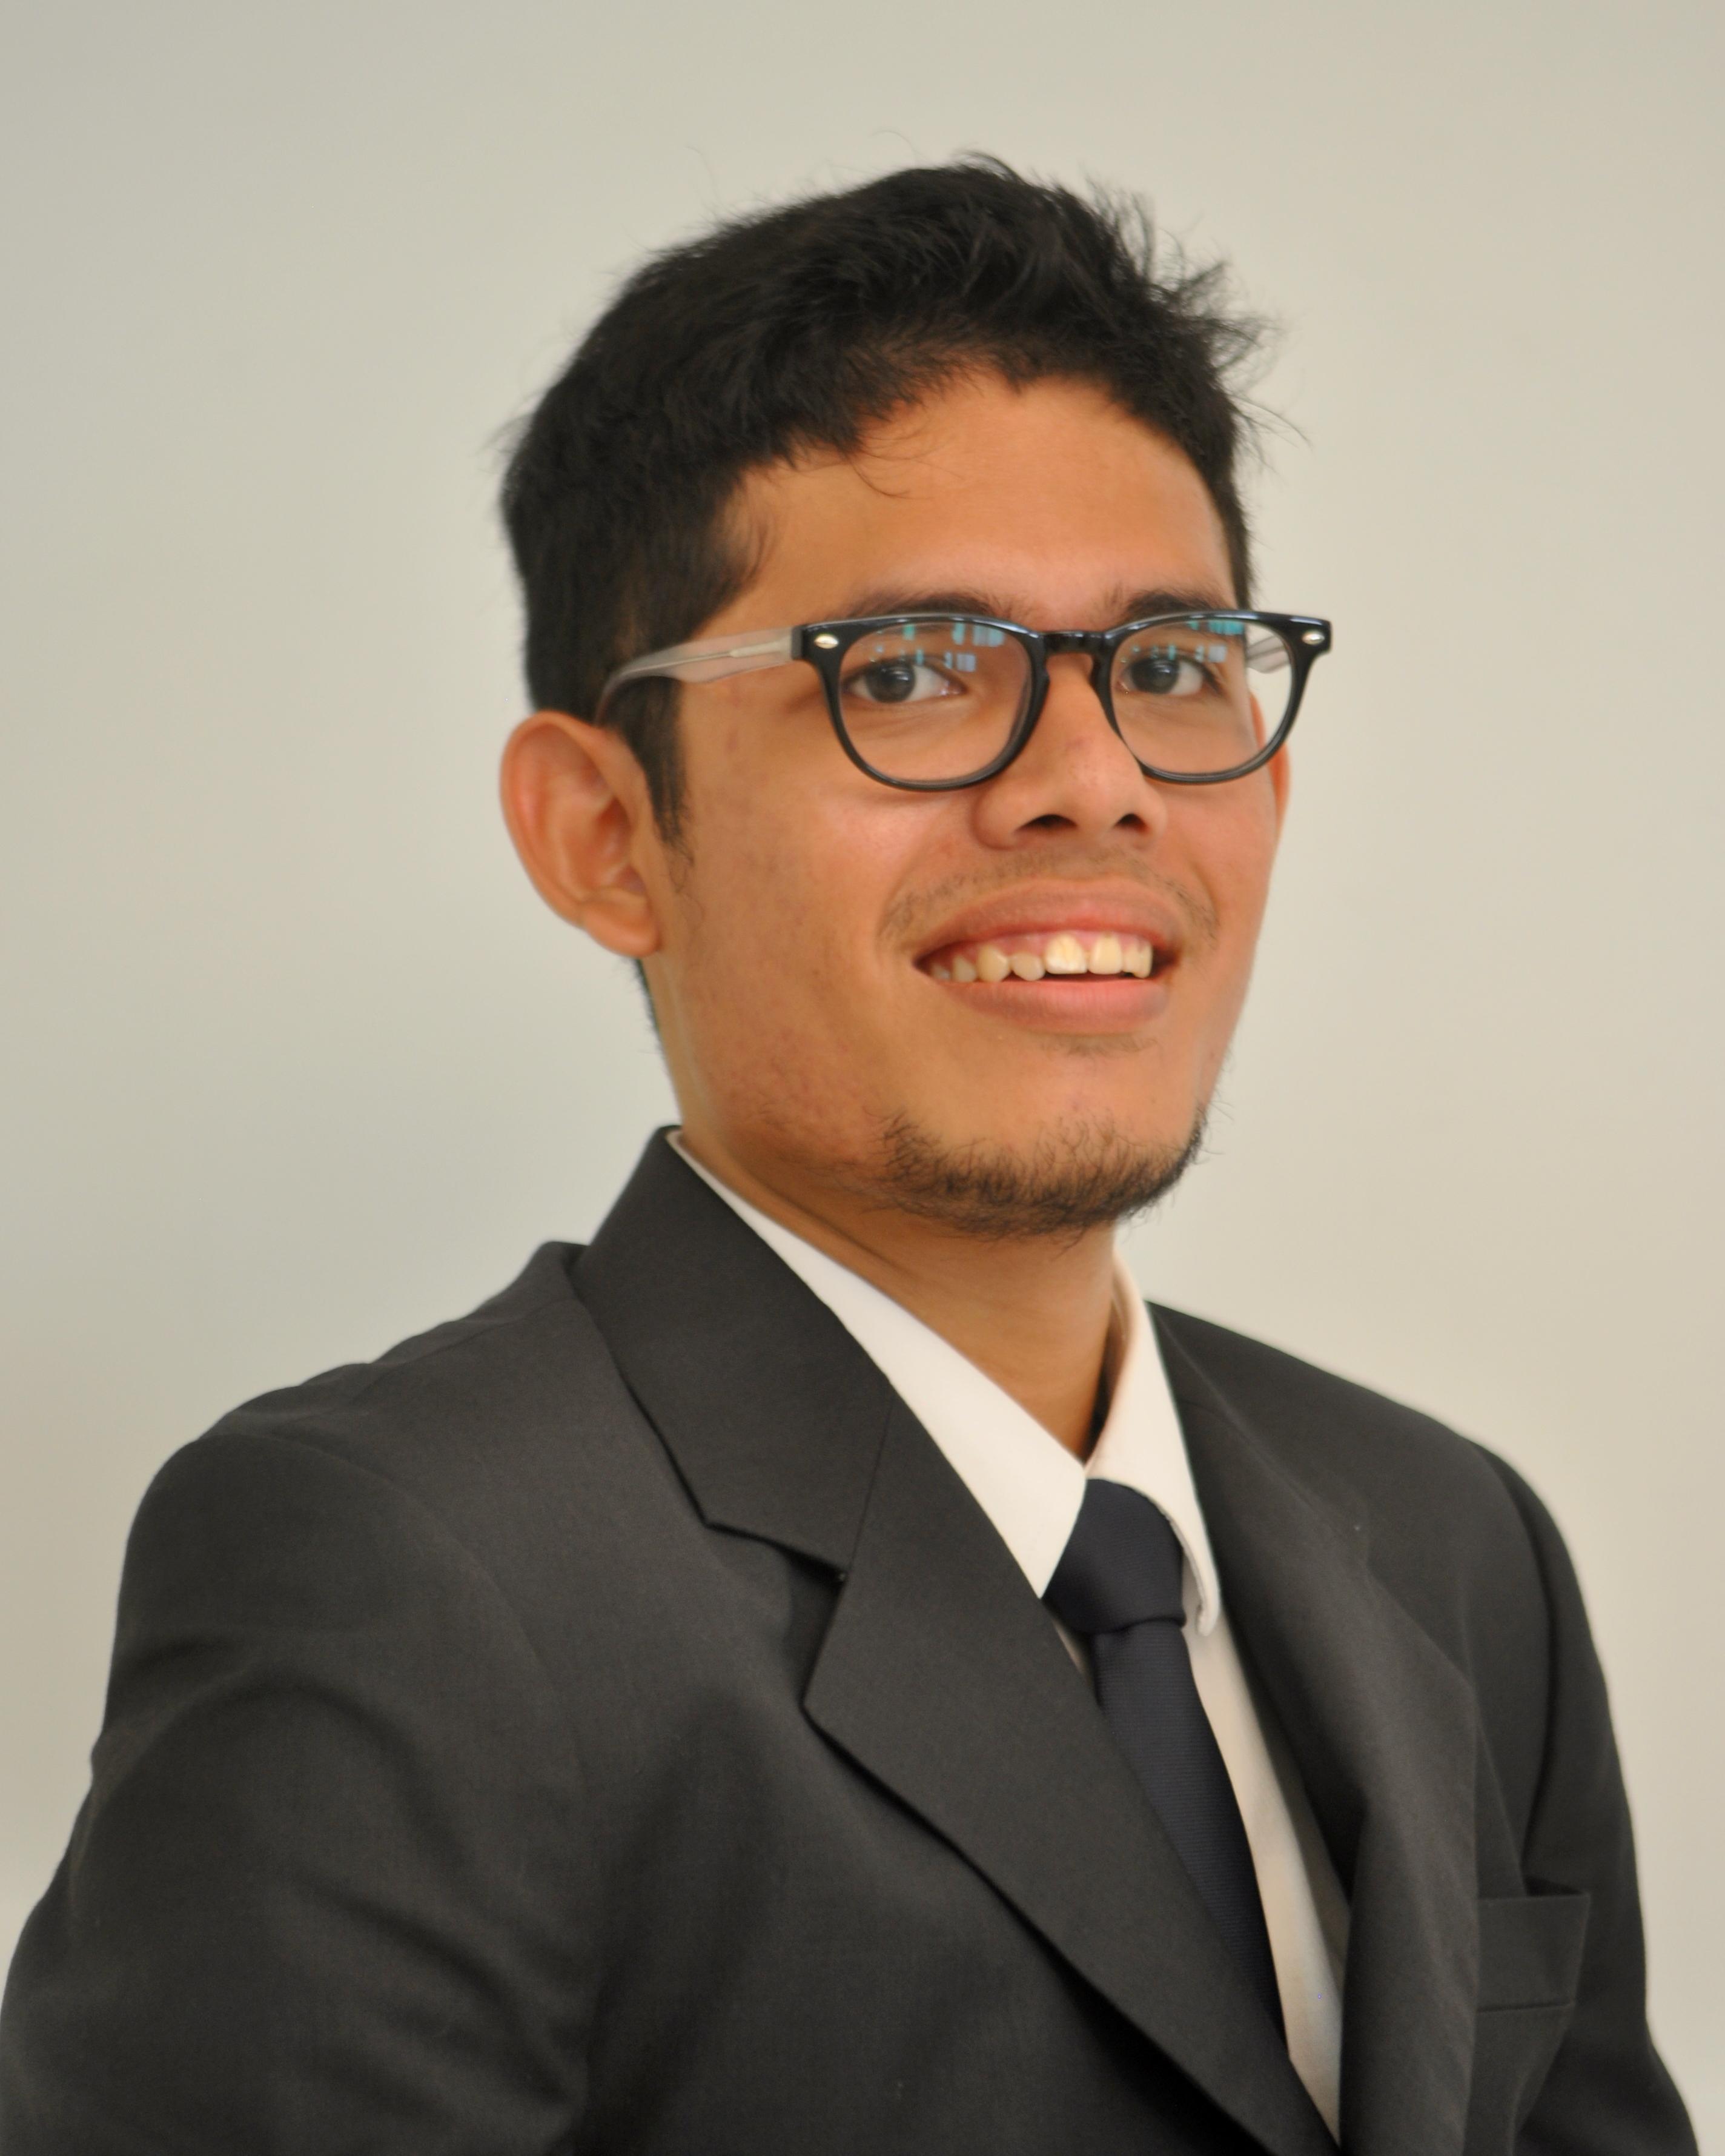 Msm 2014 Student Profile Sbm Itb